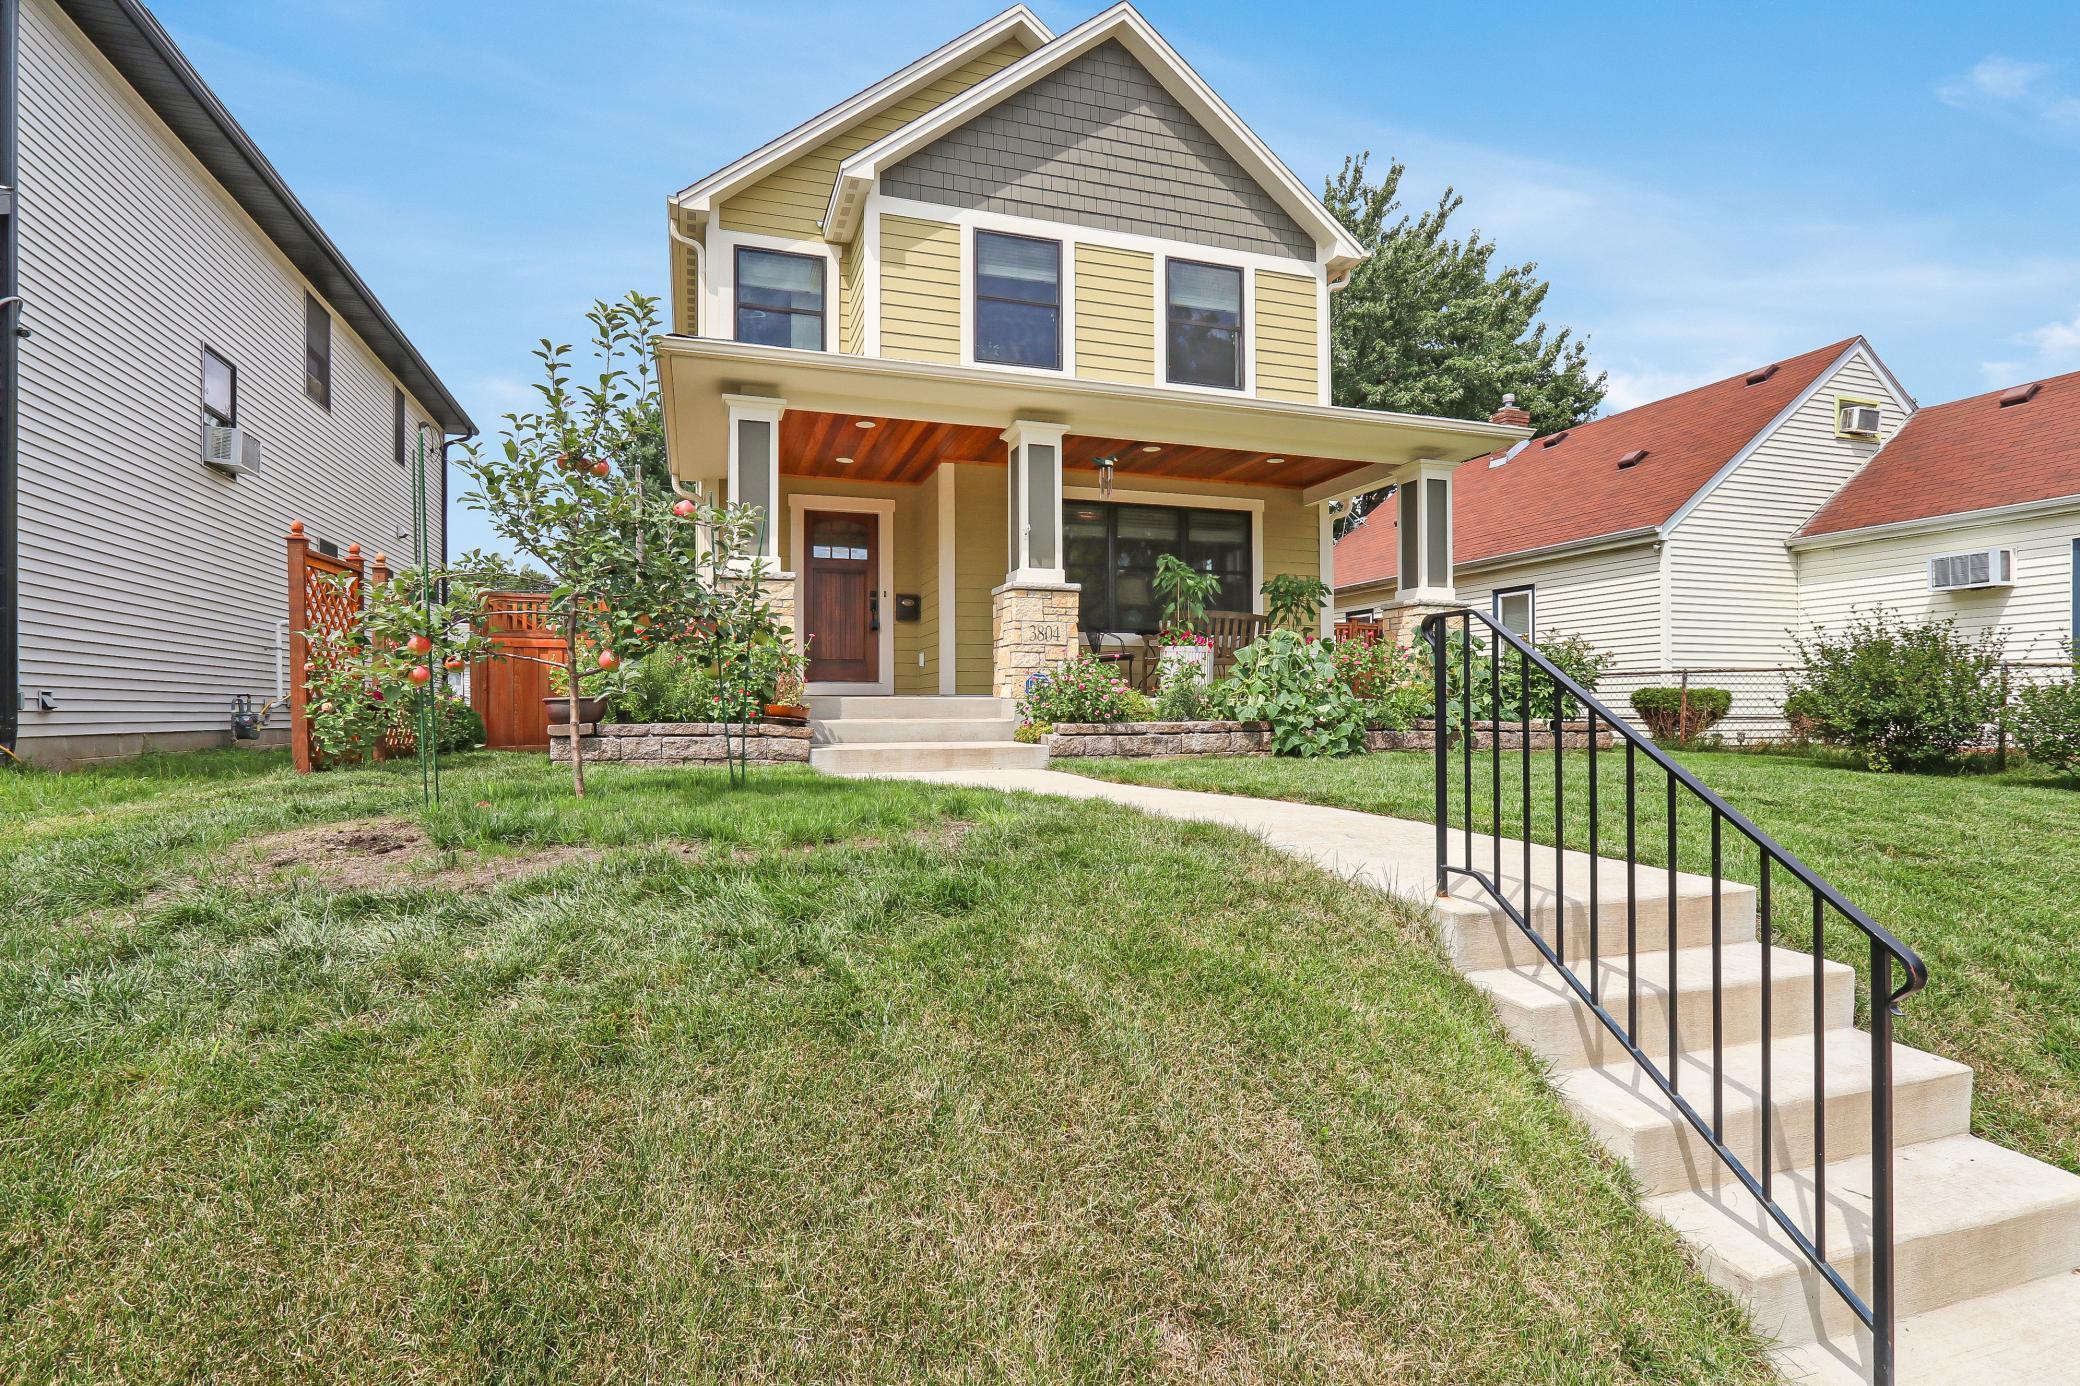 3804 41st Avenue S Property Photo - Minneapolis, MN real estate listing